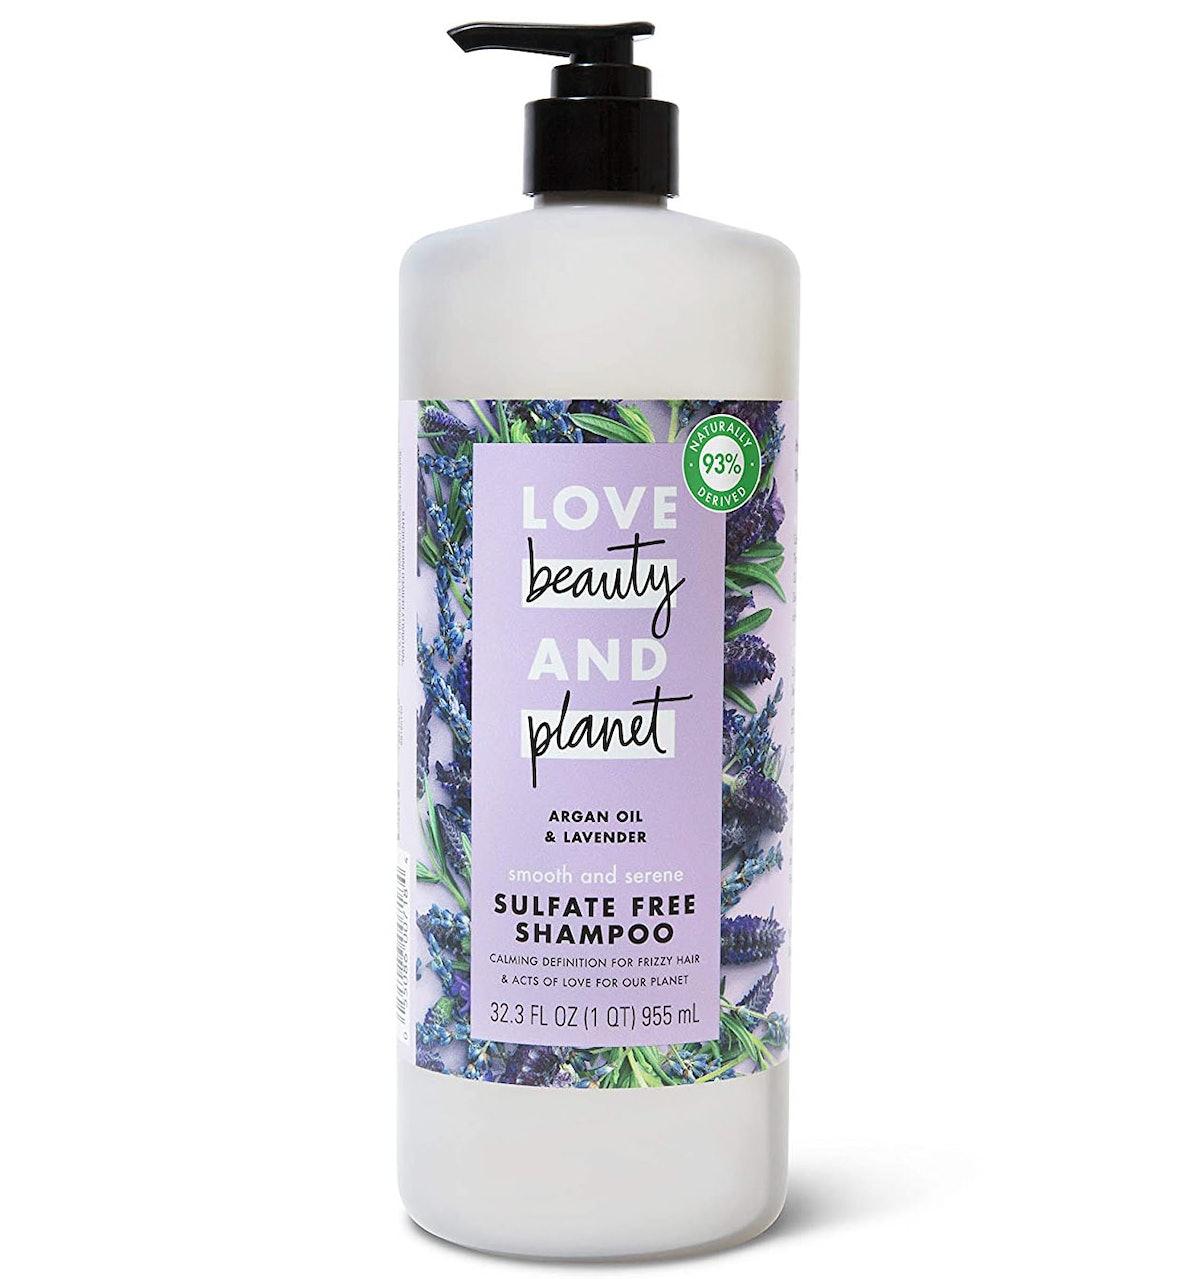 Love Beauty And Planet Smooth & Serene Shampoo